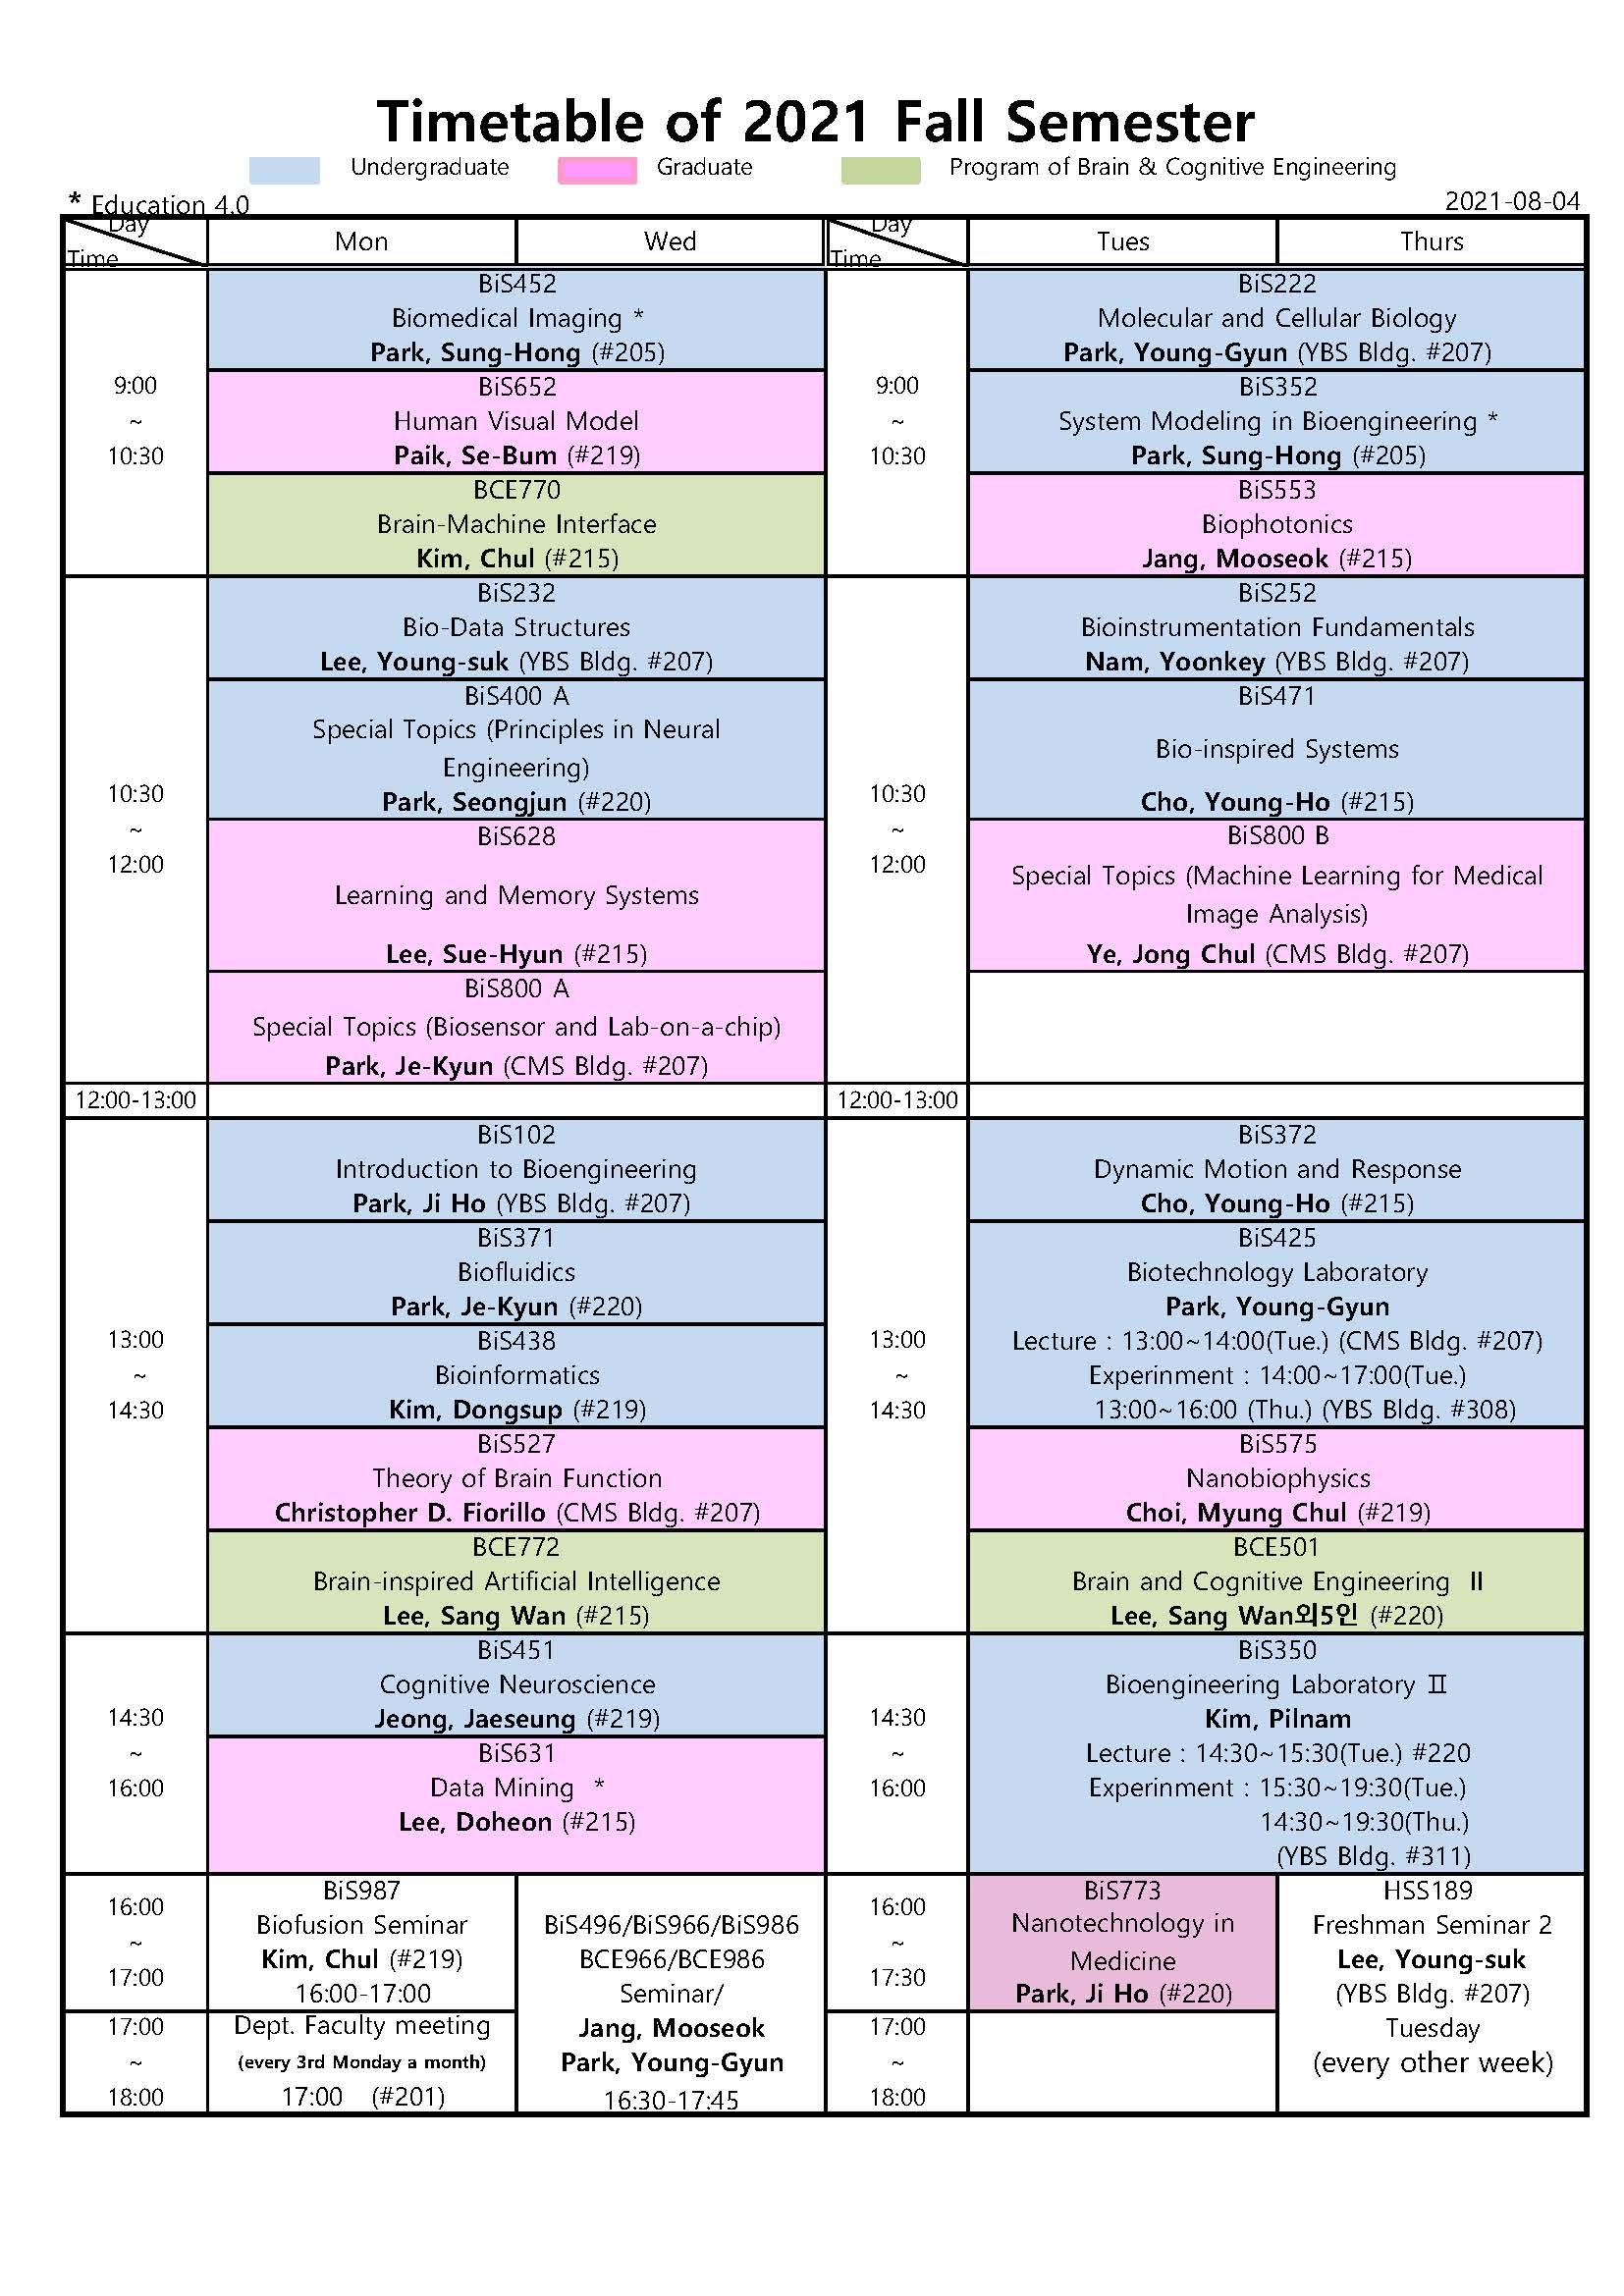 Timetable2021_Fall_210804.jpg